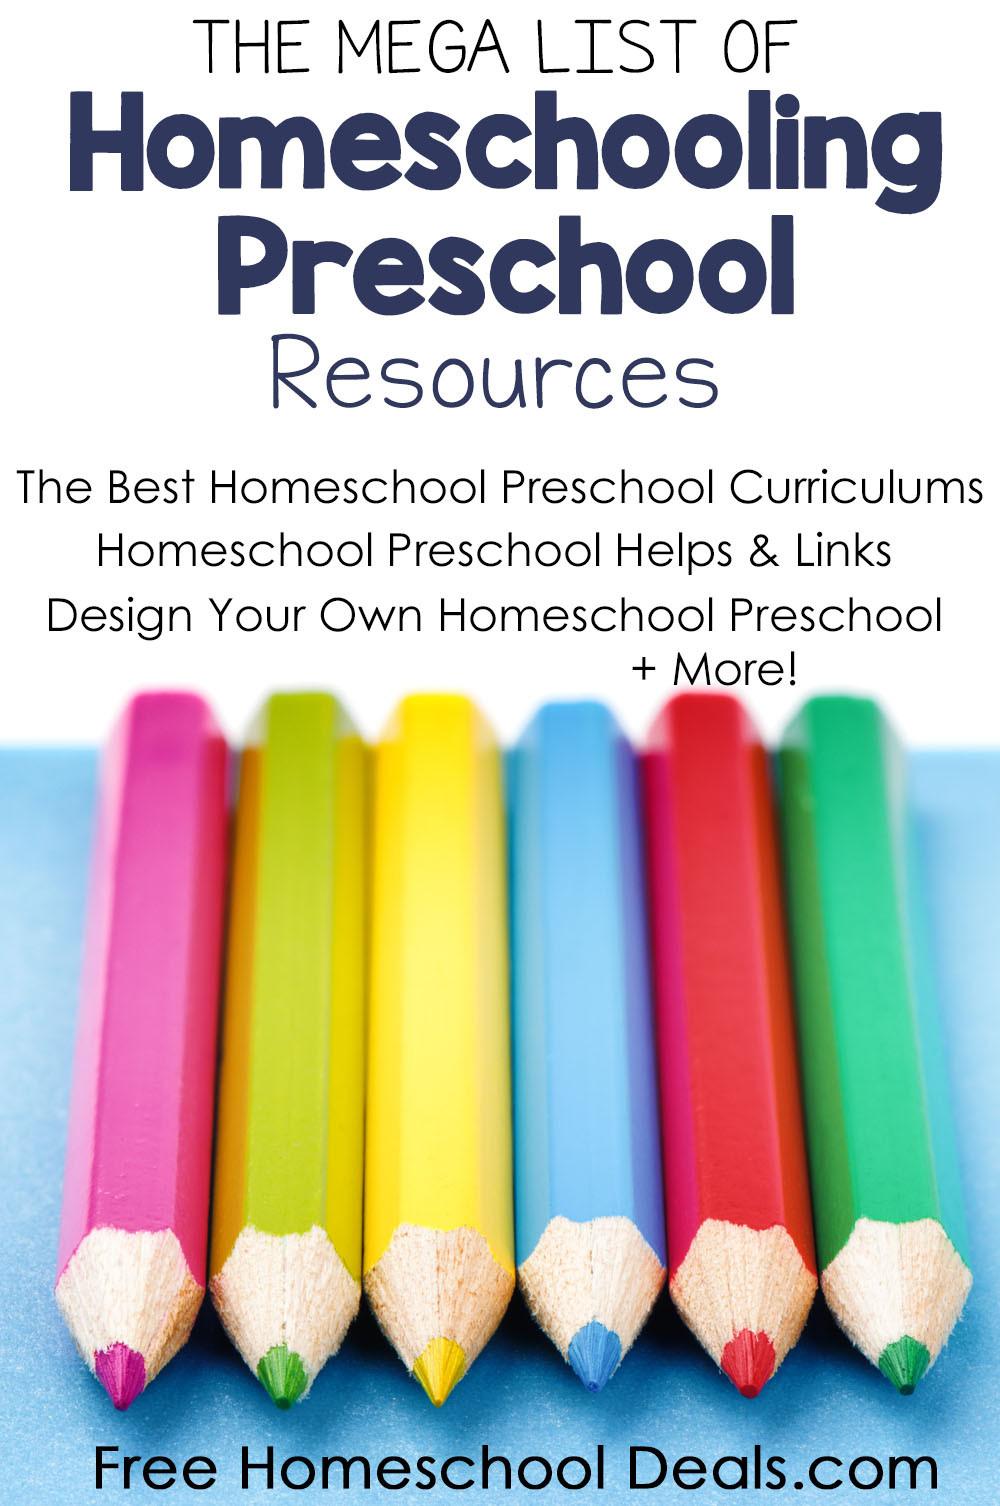 Preschool Palace Curriculum Mega List Of Homeschooling Preschool Resources